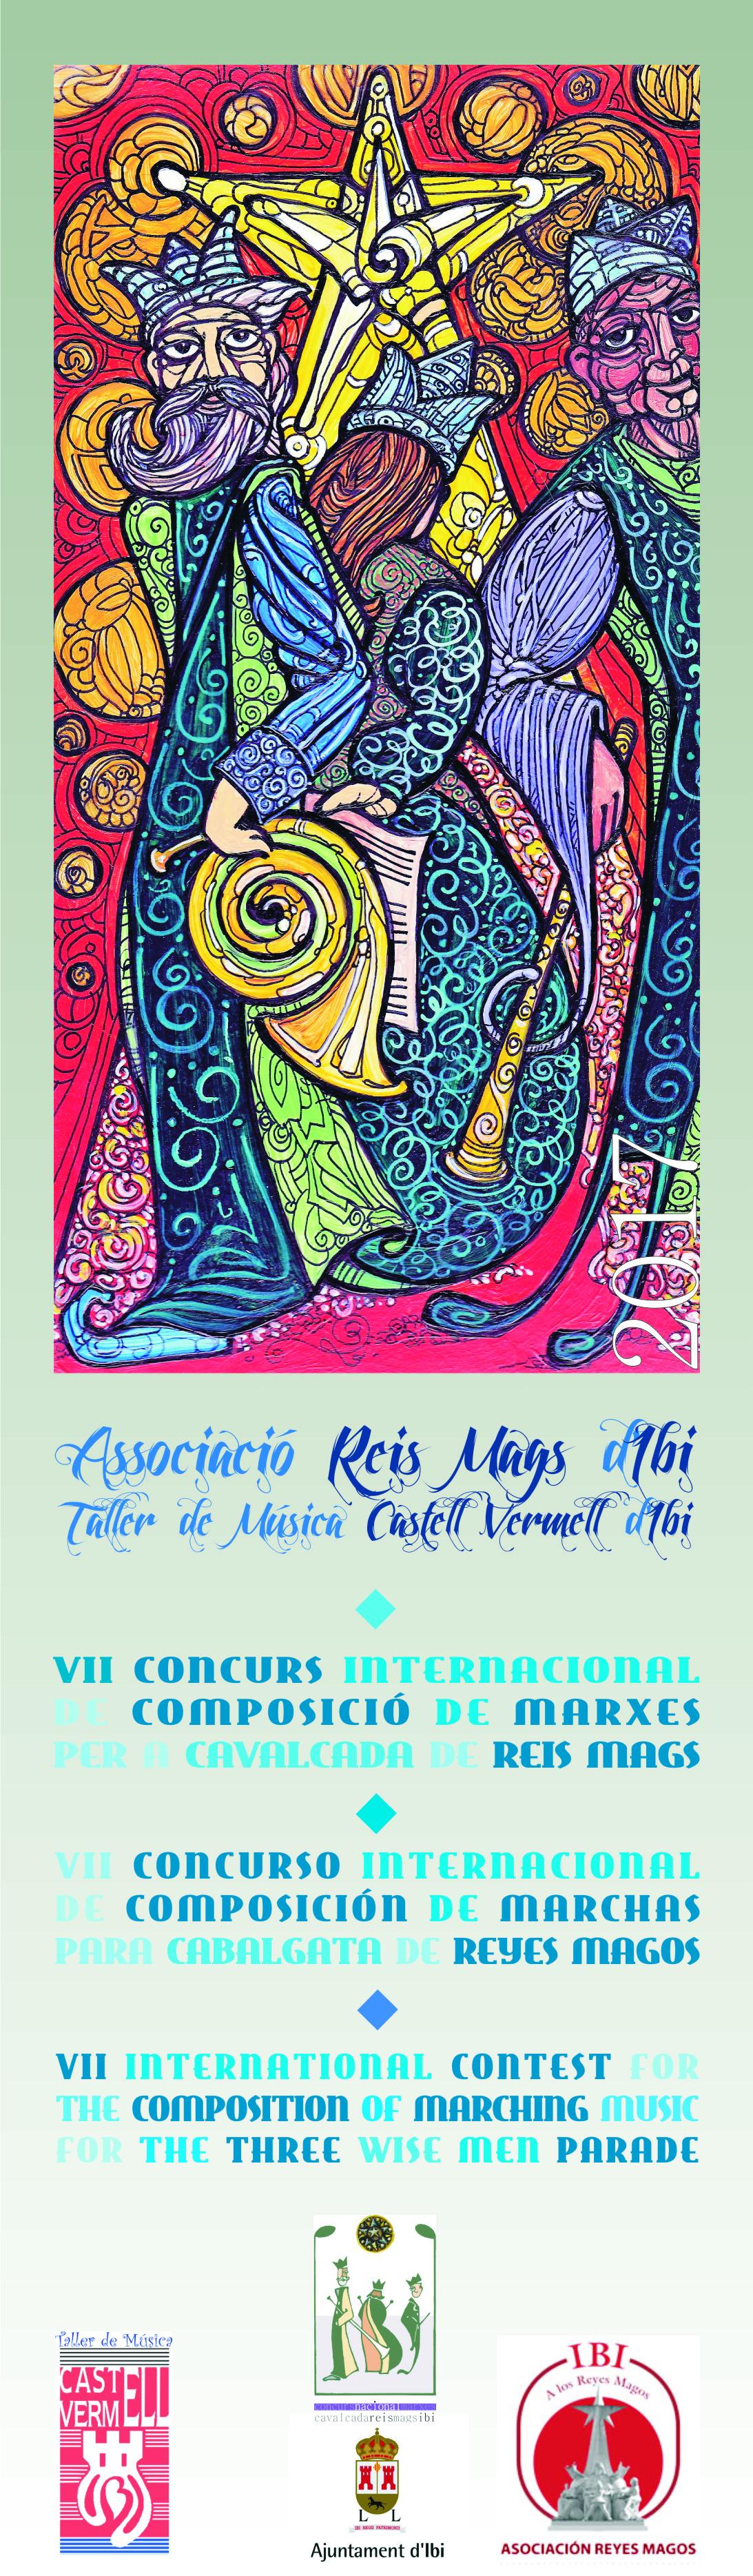 Bases VII Concurs Composició Marxes Cavalcada Reis Mags / Bases VII Concurso Composición Marchas Cabalgata Reyes 2017